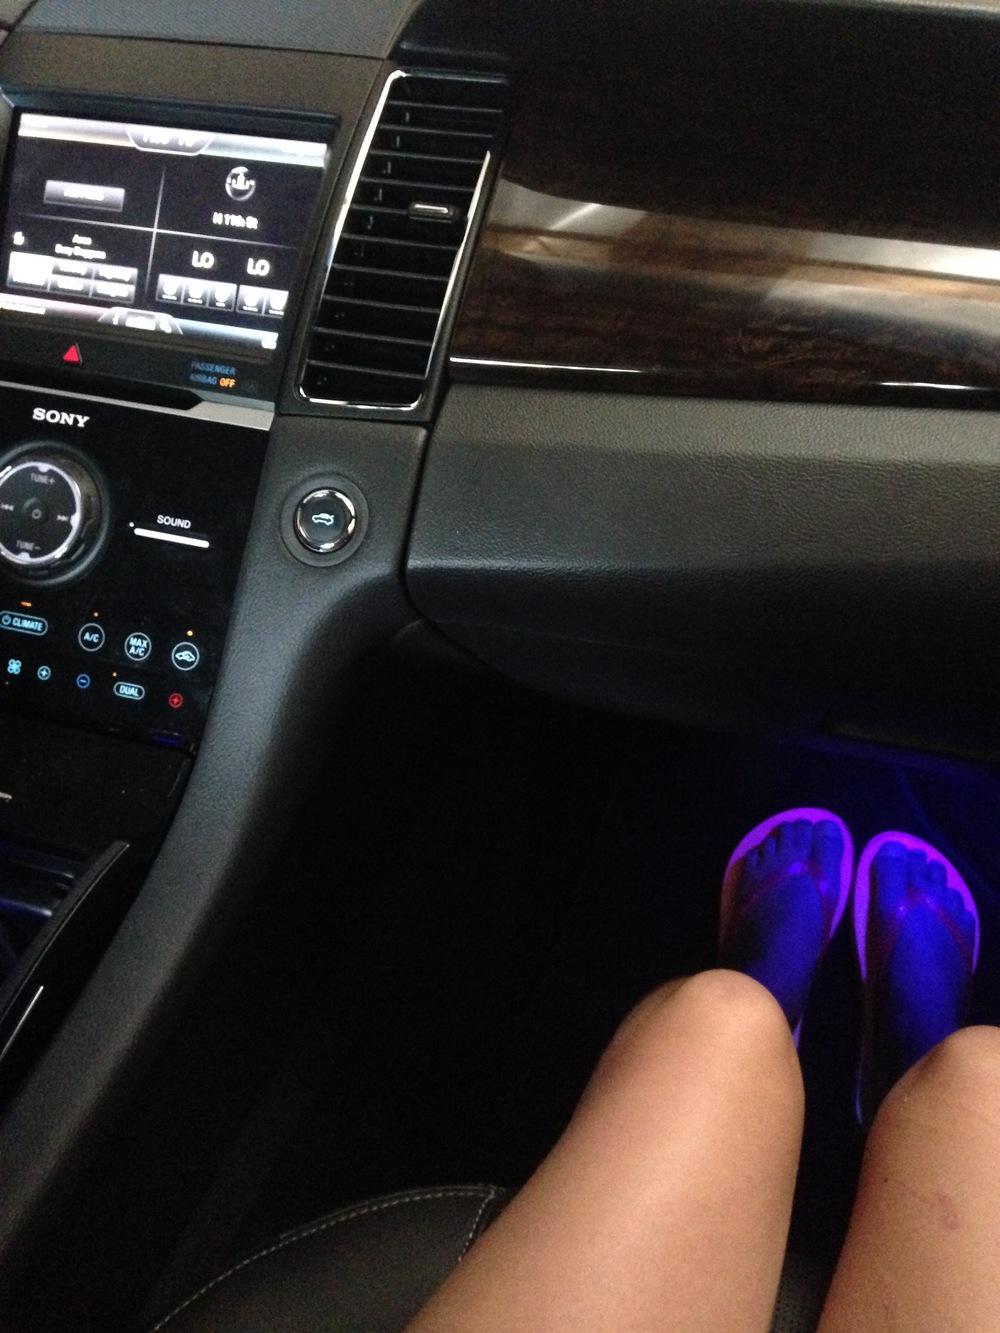 Gramps-New-Car-and-Ashlee-Feet.jpg